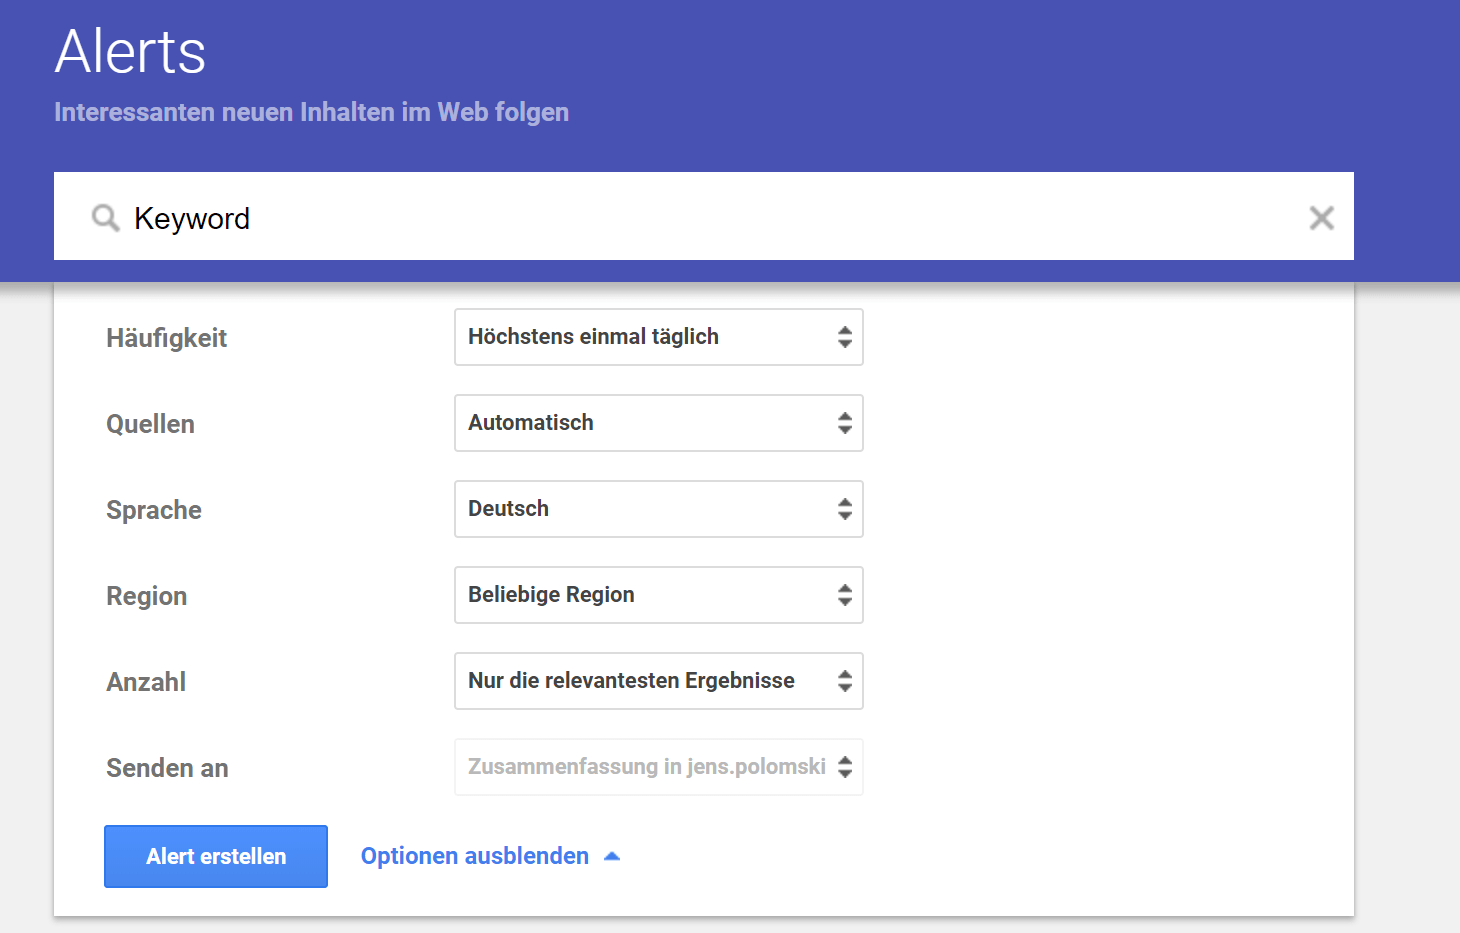 Google Alerts Social Media Monitoring Tool